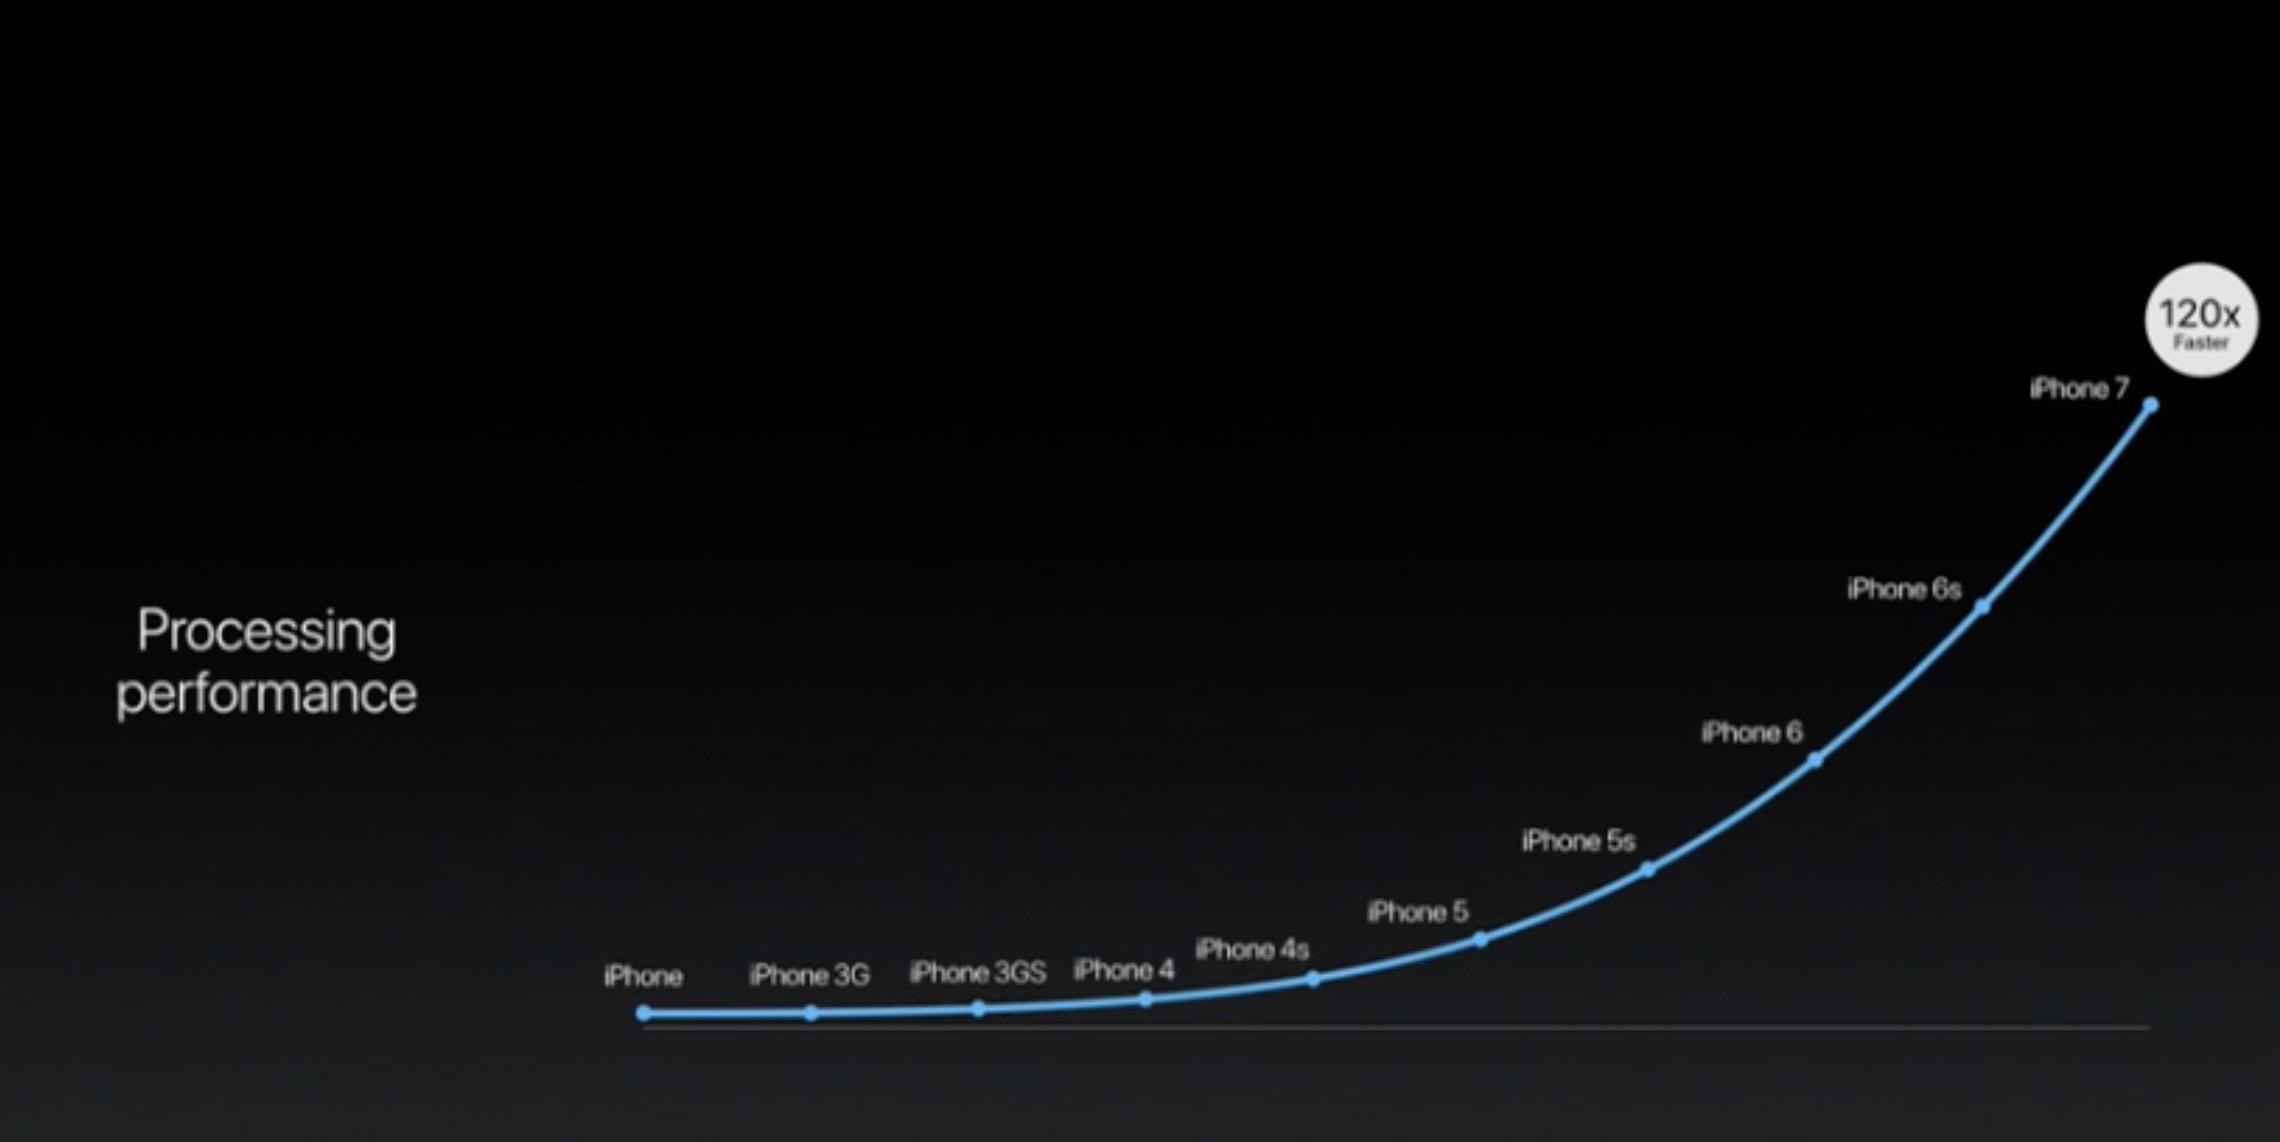 Performance processore iPhone 7